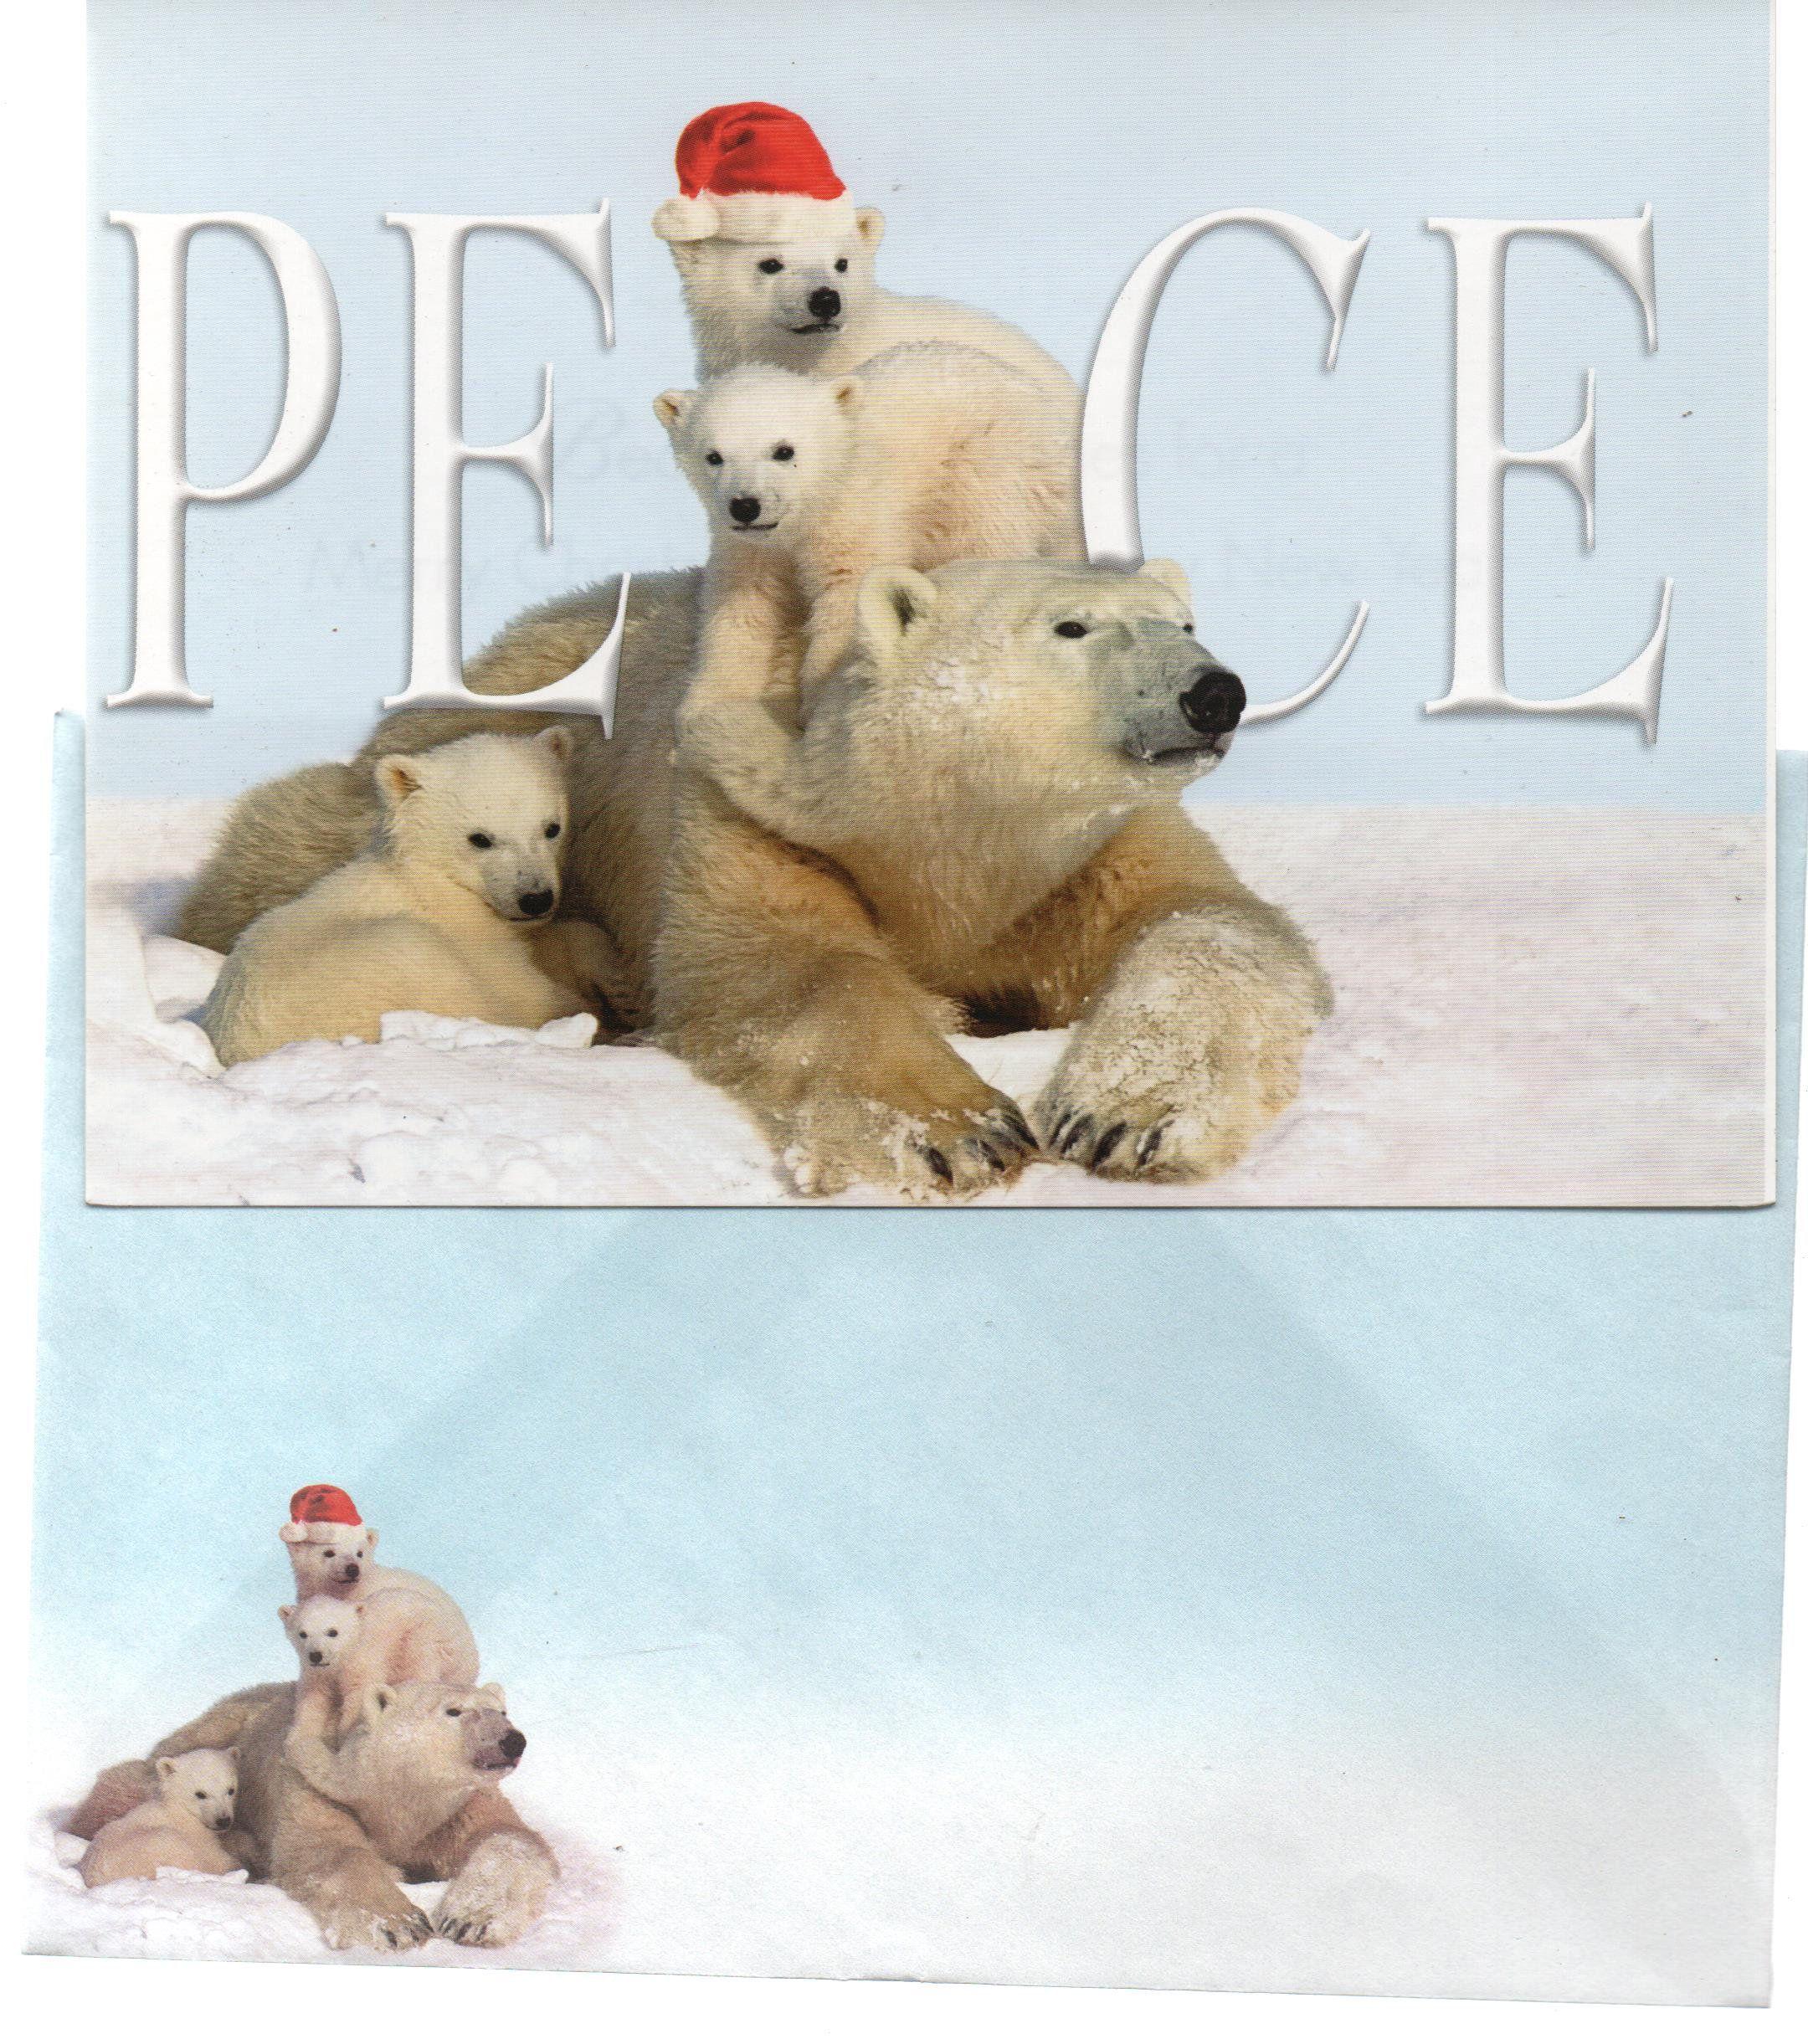 National Wildlife Christmas Cards 2021 Peace Unused Christmas Greeting Card Polar Bears C1990s Etsy In 2021 Christmas Greeting Cards Christmas Greetings Vintage Christmas Cards